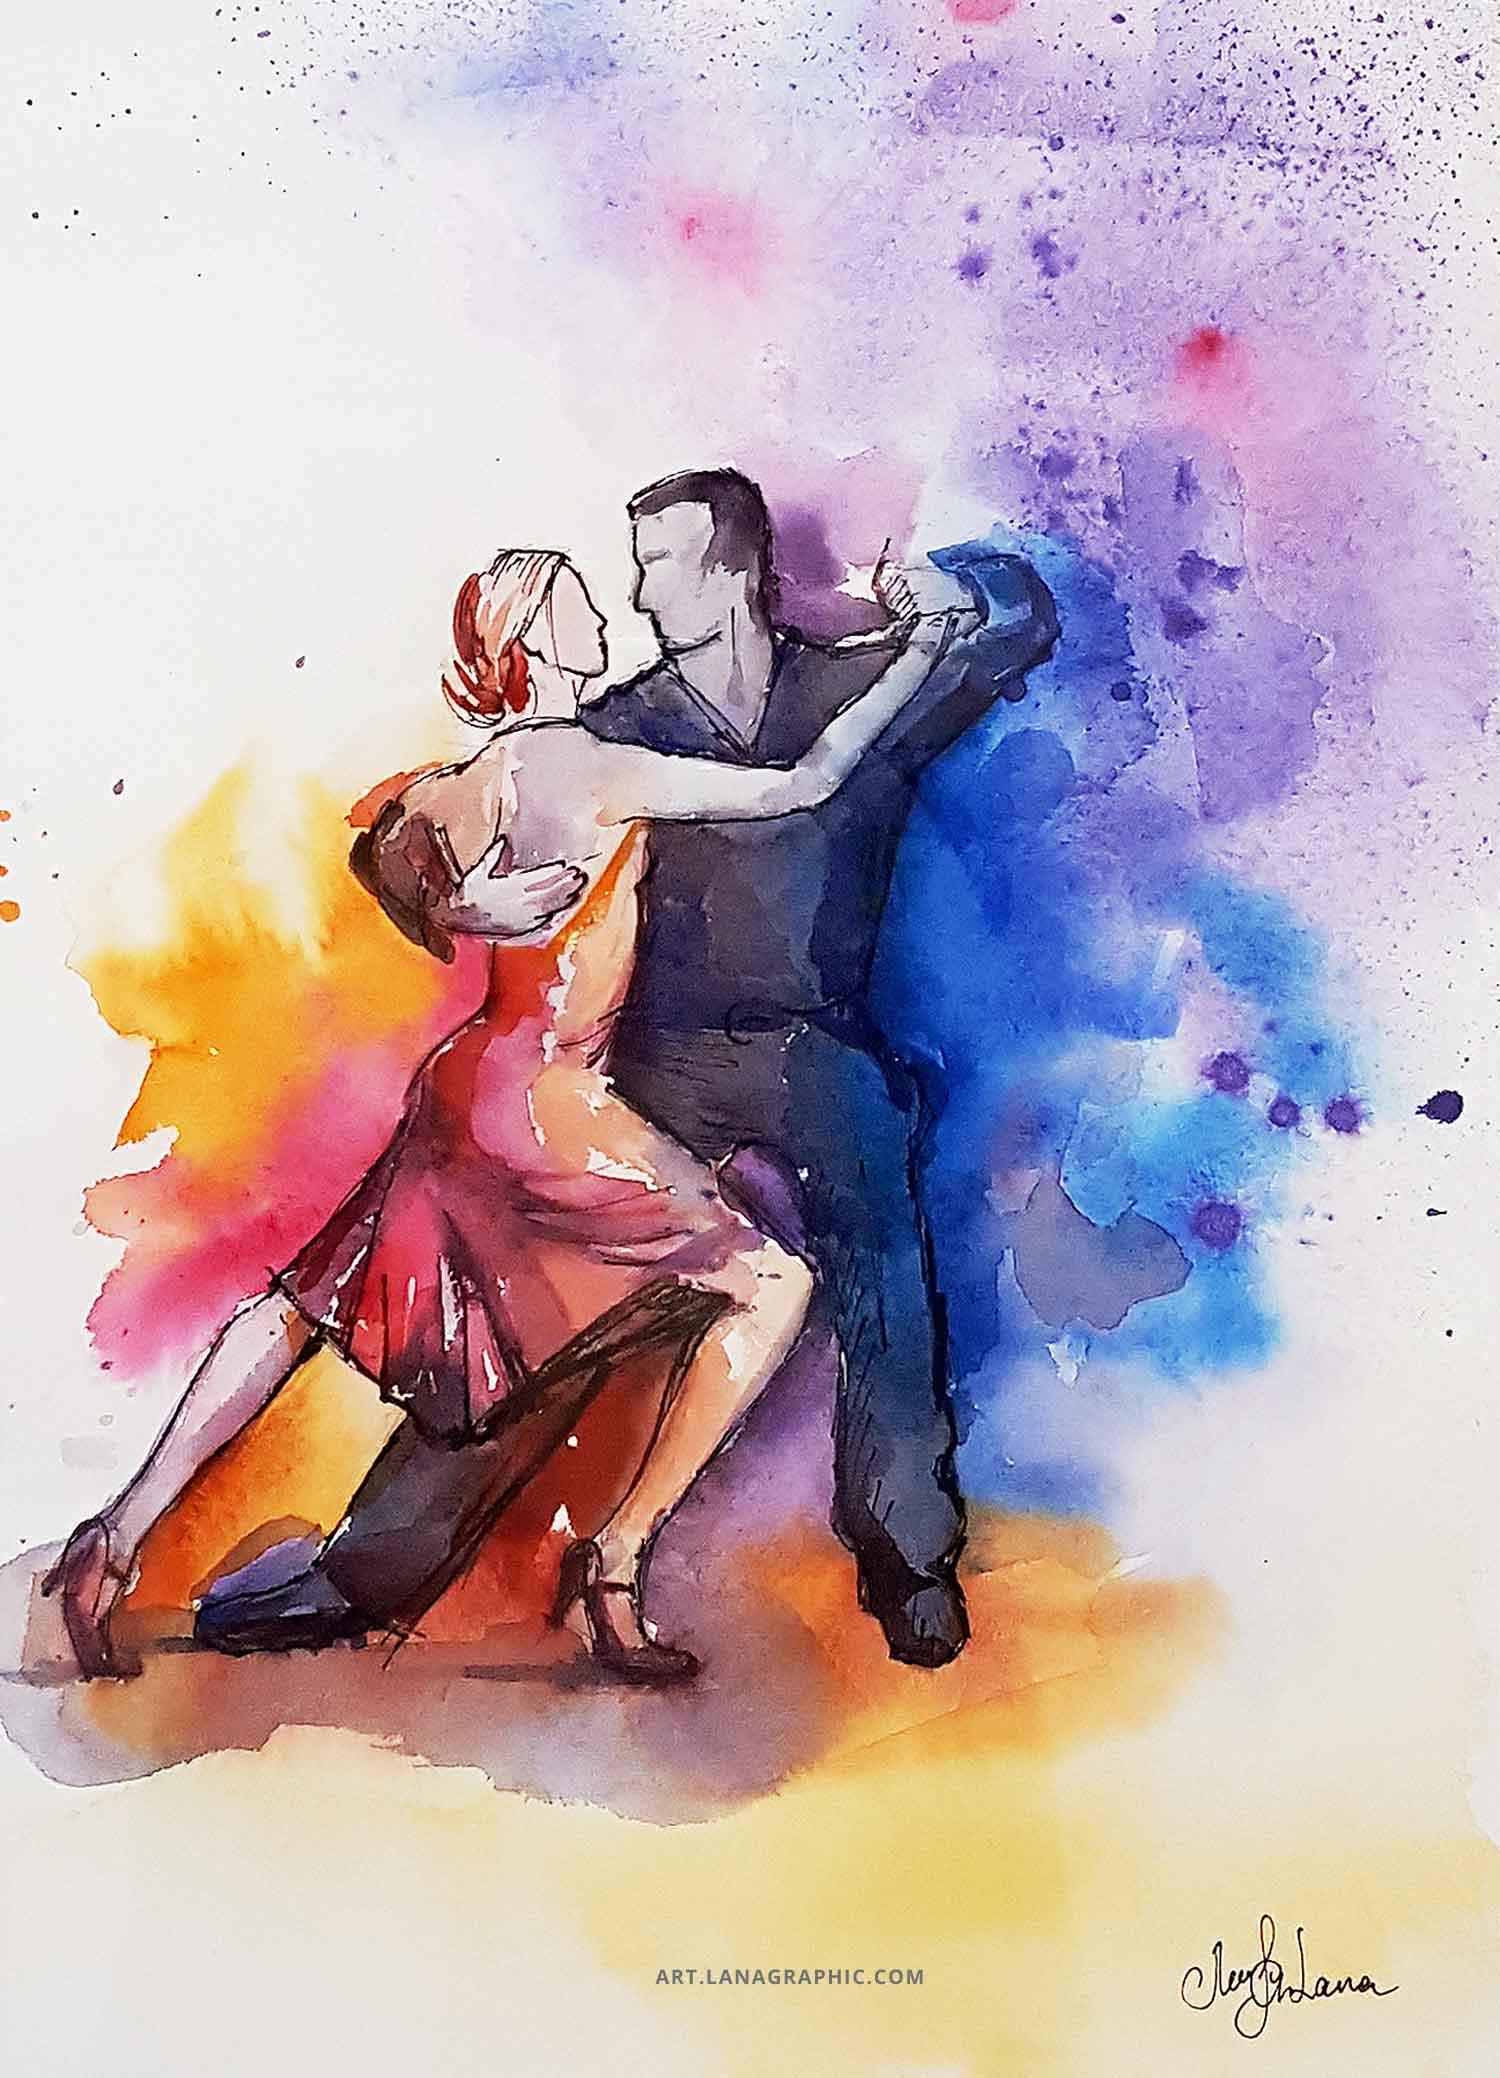 Lana-Leuchuk-Let's-dance-2018